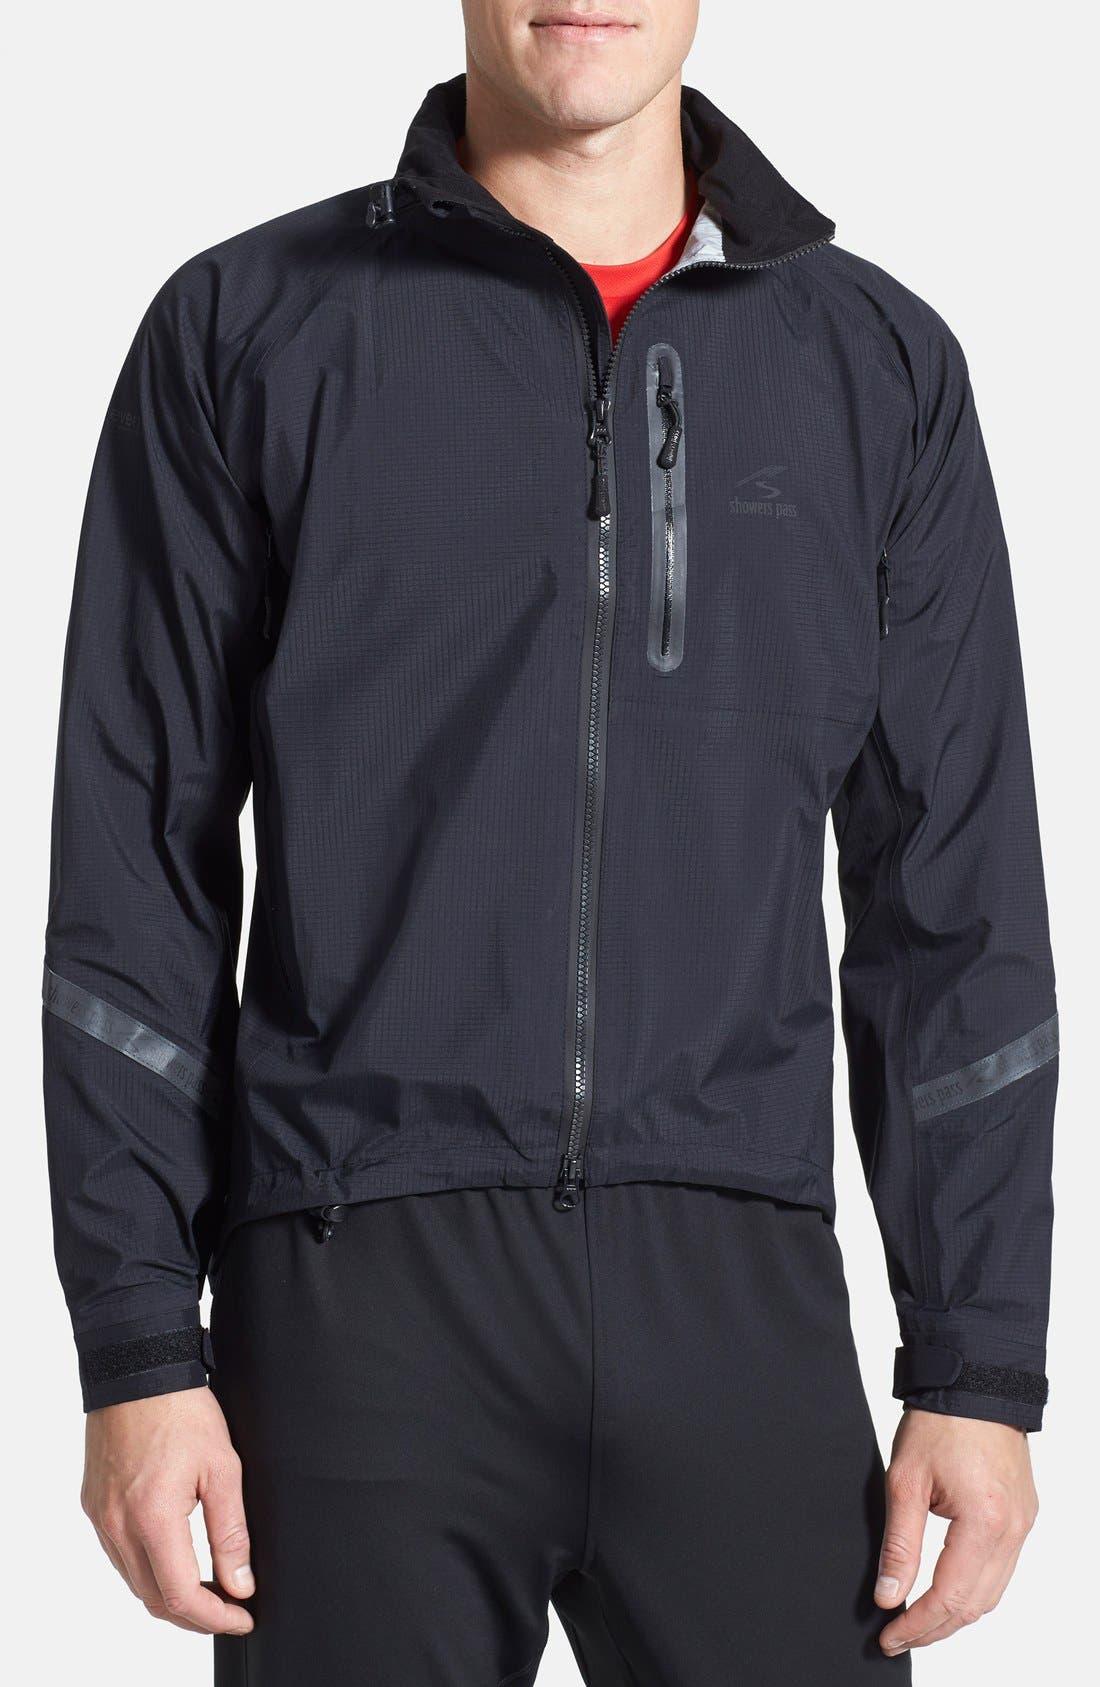 SHOWERS PASS 'Elite 2.1' Trim Fit Waterproof Hooded Jacket, Main, color, 001